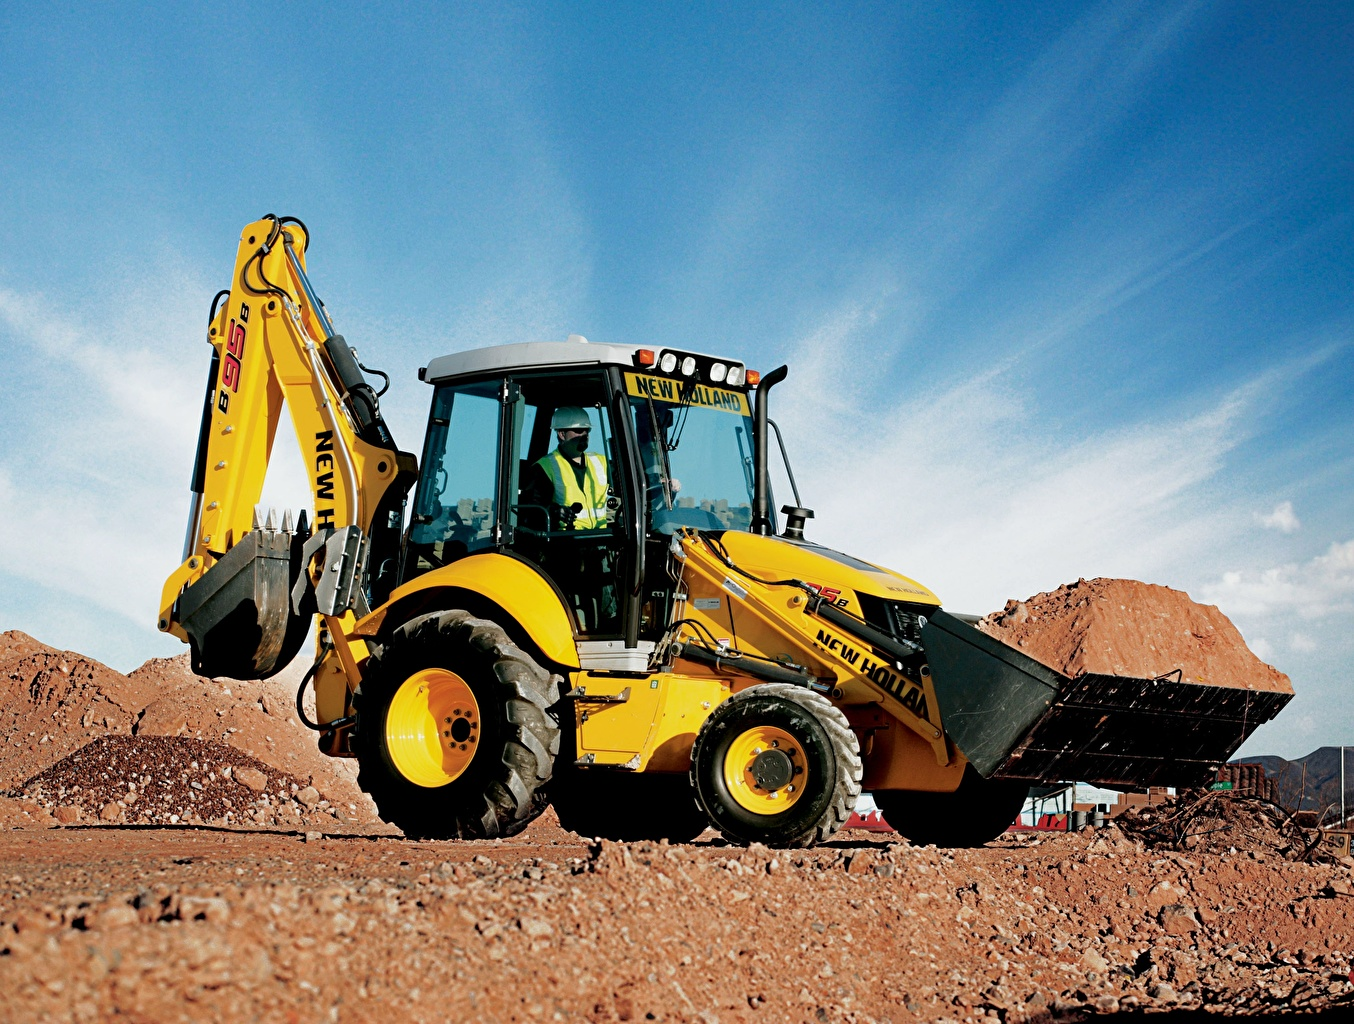 Picture Excavator front-end loader 2008-16 New Holland B95B Yellow Loader payloader front loader